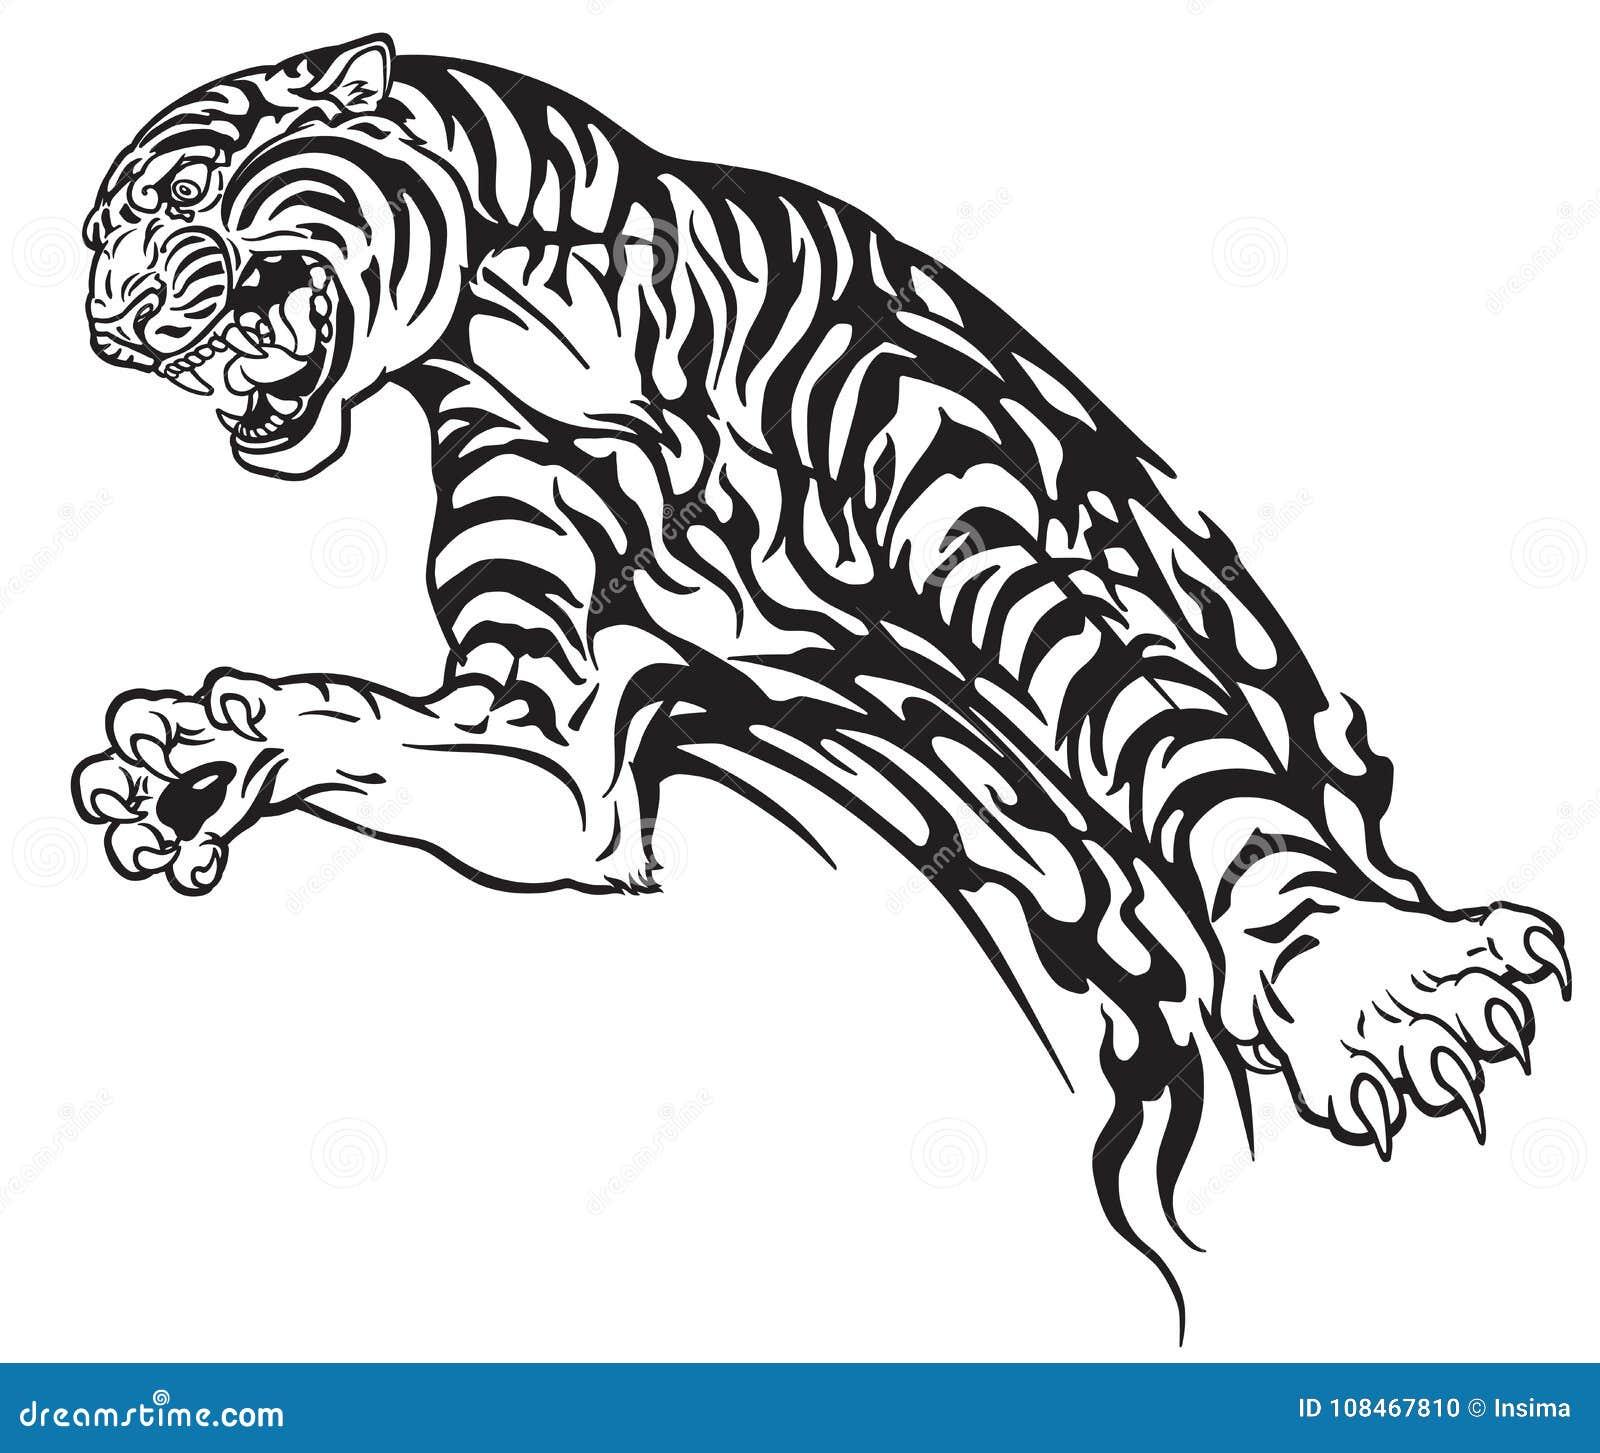 daf28ec98eb9f Tiger Tribal Stock Illustrations – 6,730 Tiger Tribal Stock Illustrations,  Vectors & Clipart - Dreamstime